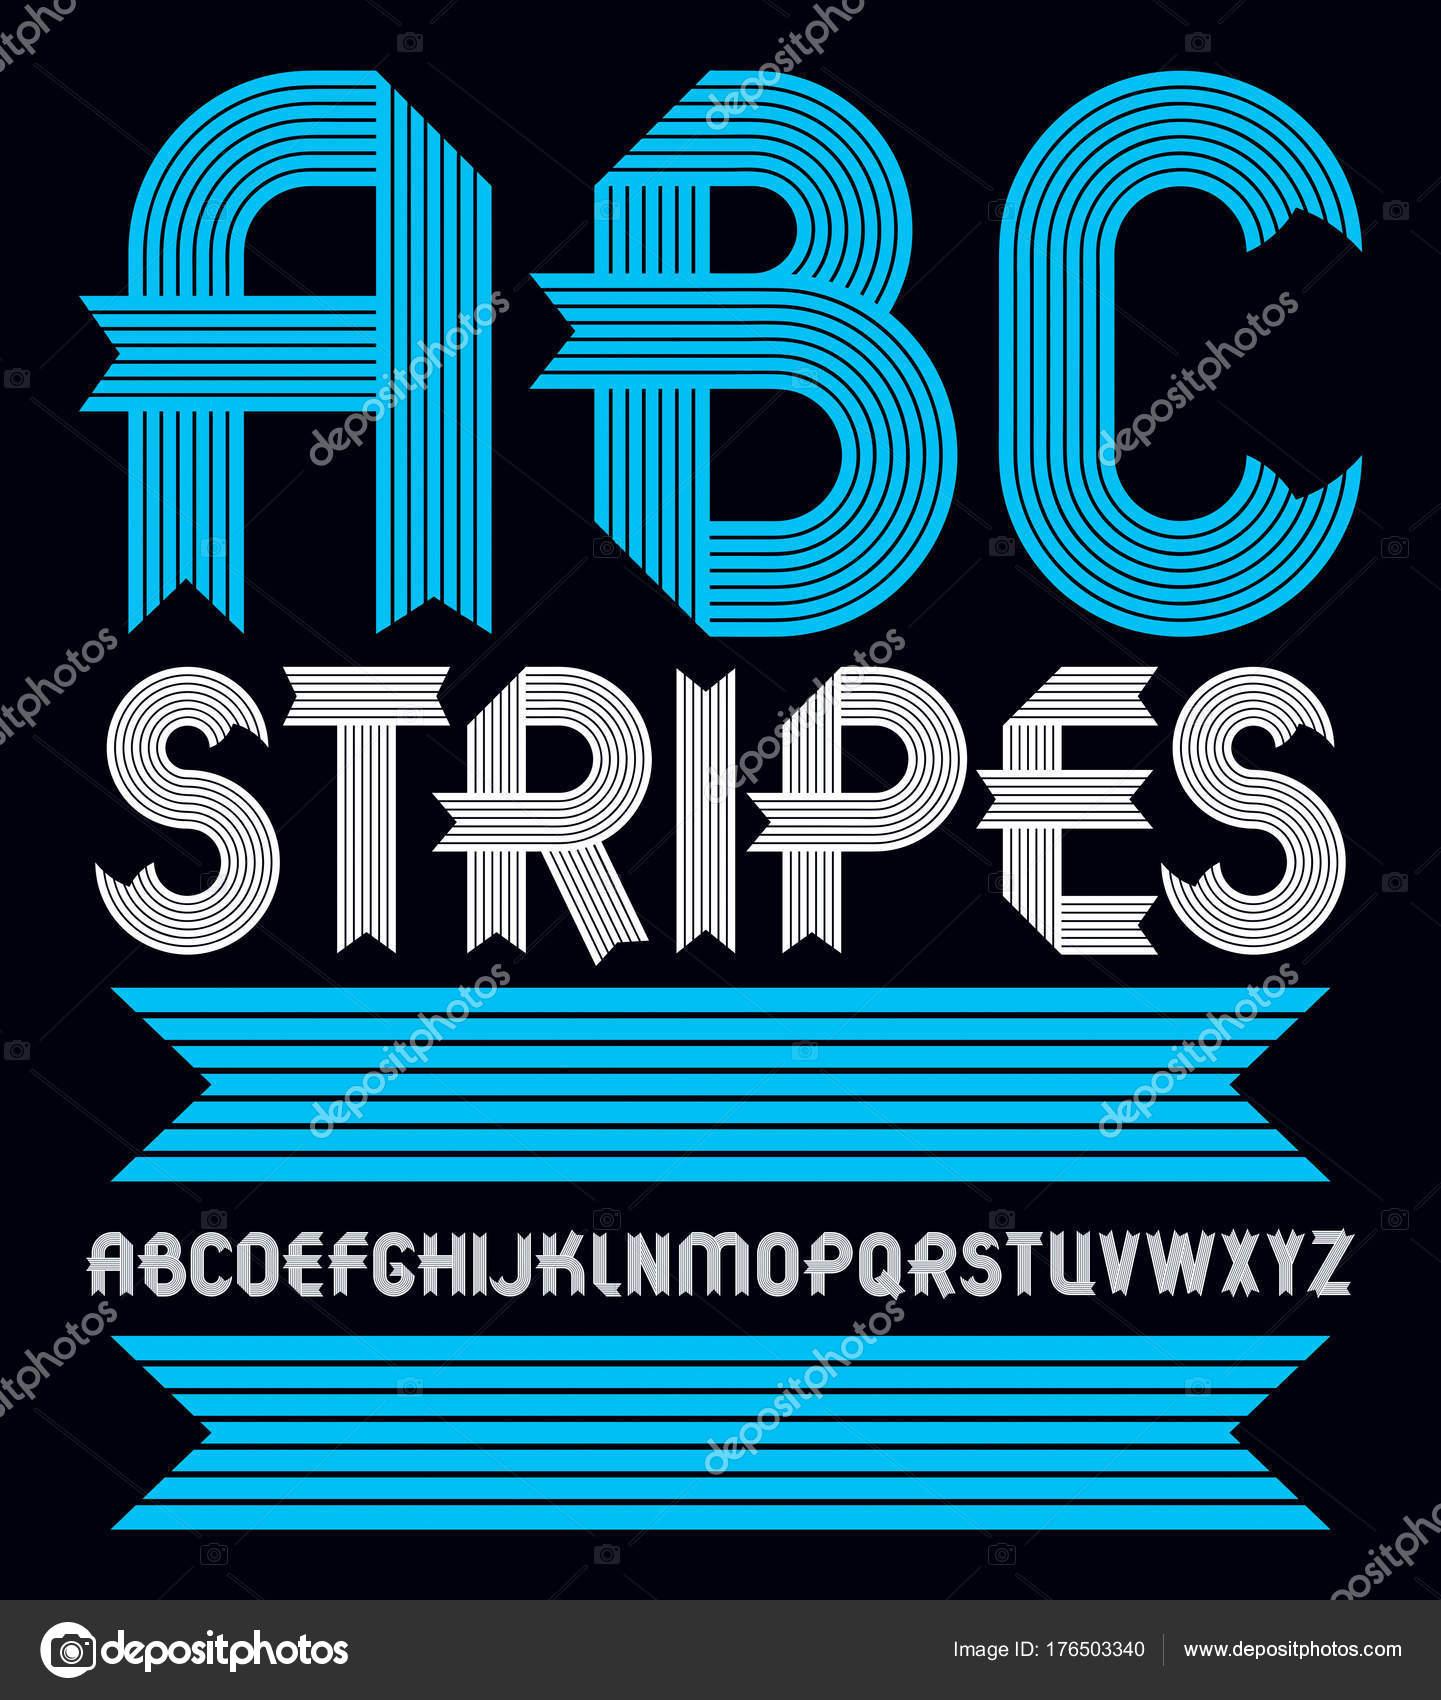 Abc Creation pour set trendy vector capital alphabet letters abc isolated geometric